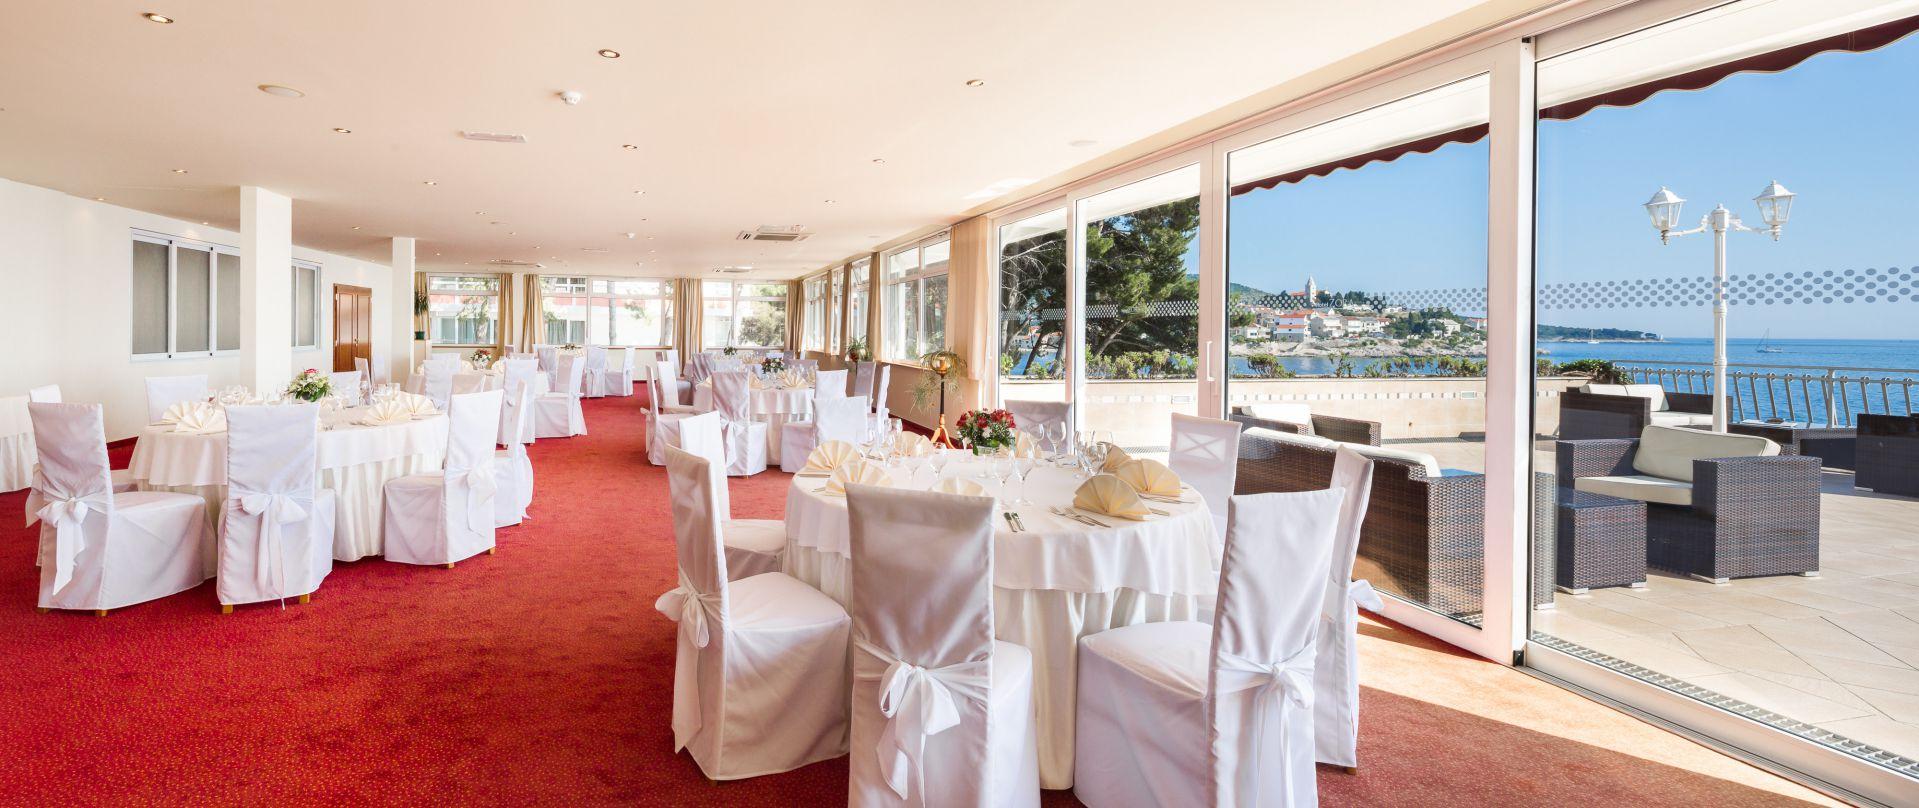 wedding piano bar 01 14823939924 o - Zora Hotel